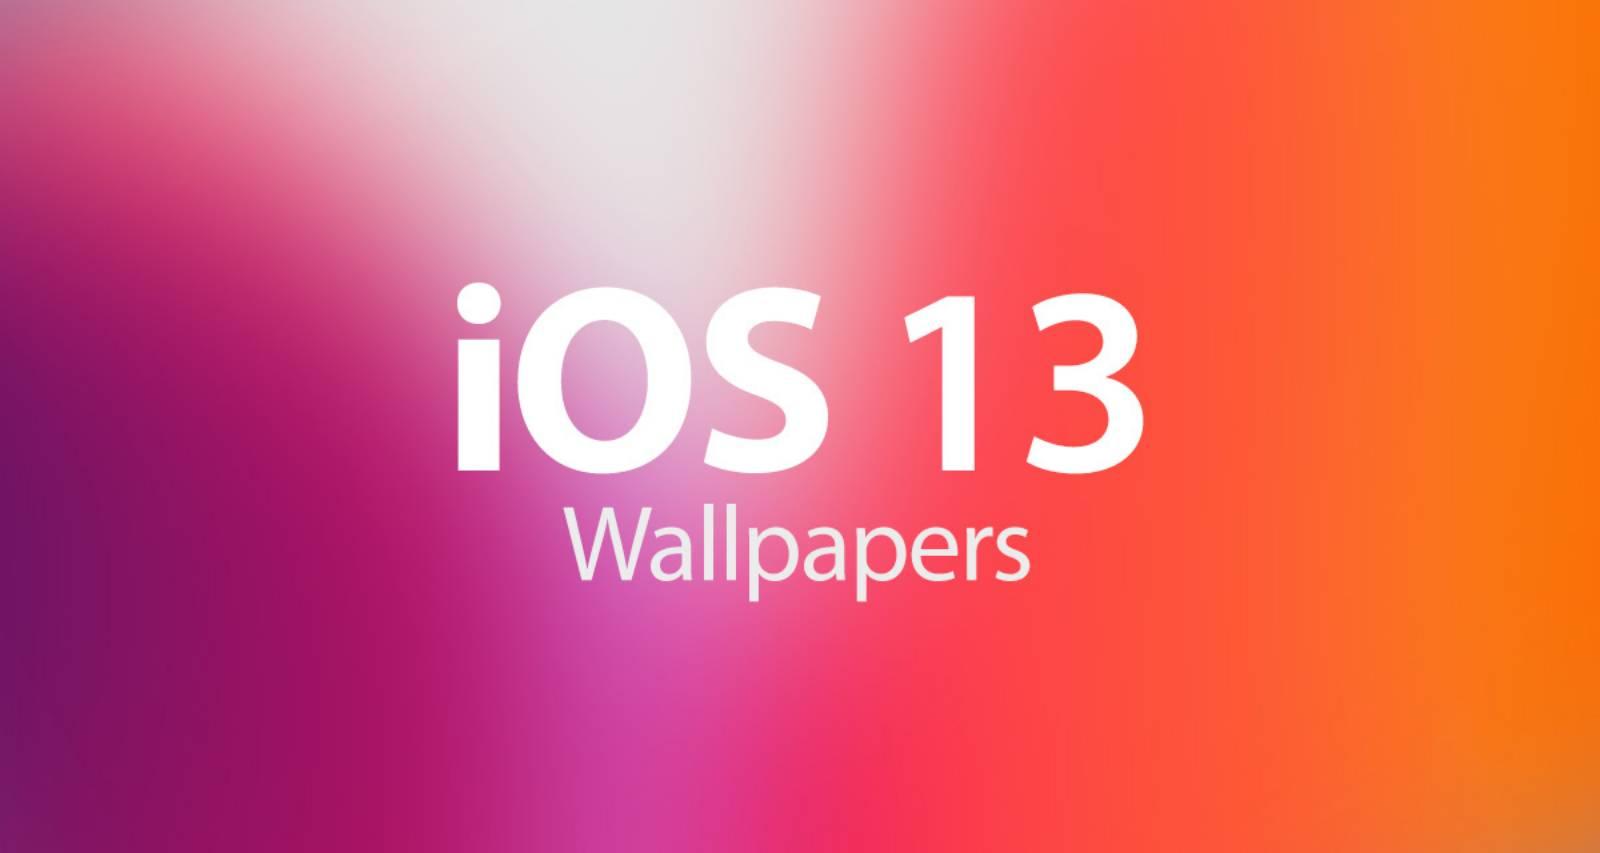 iOS 13 wallpaper download